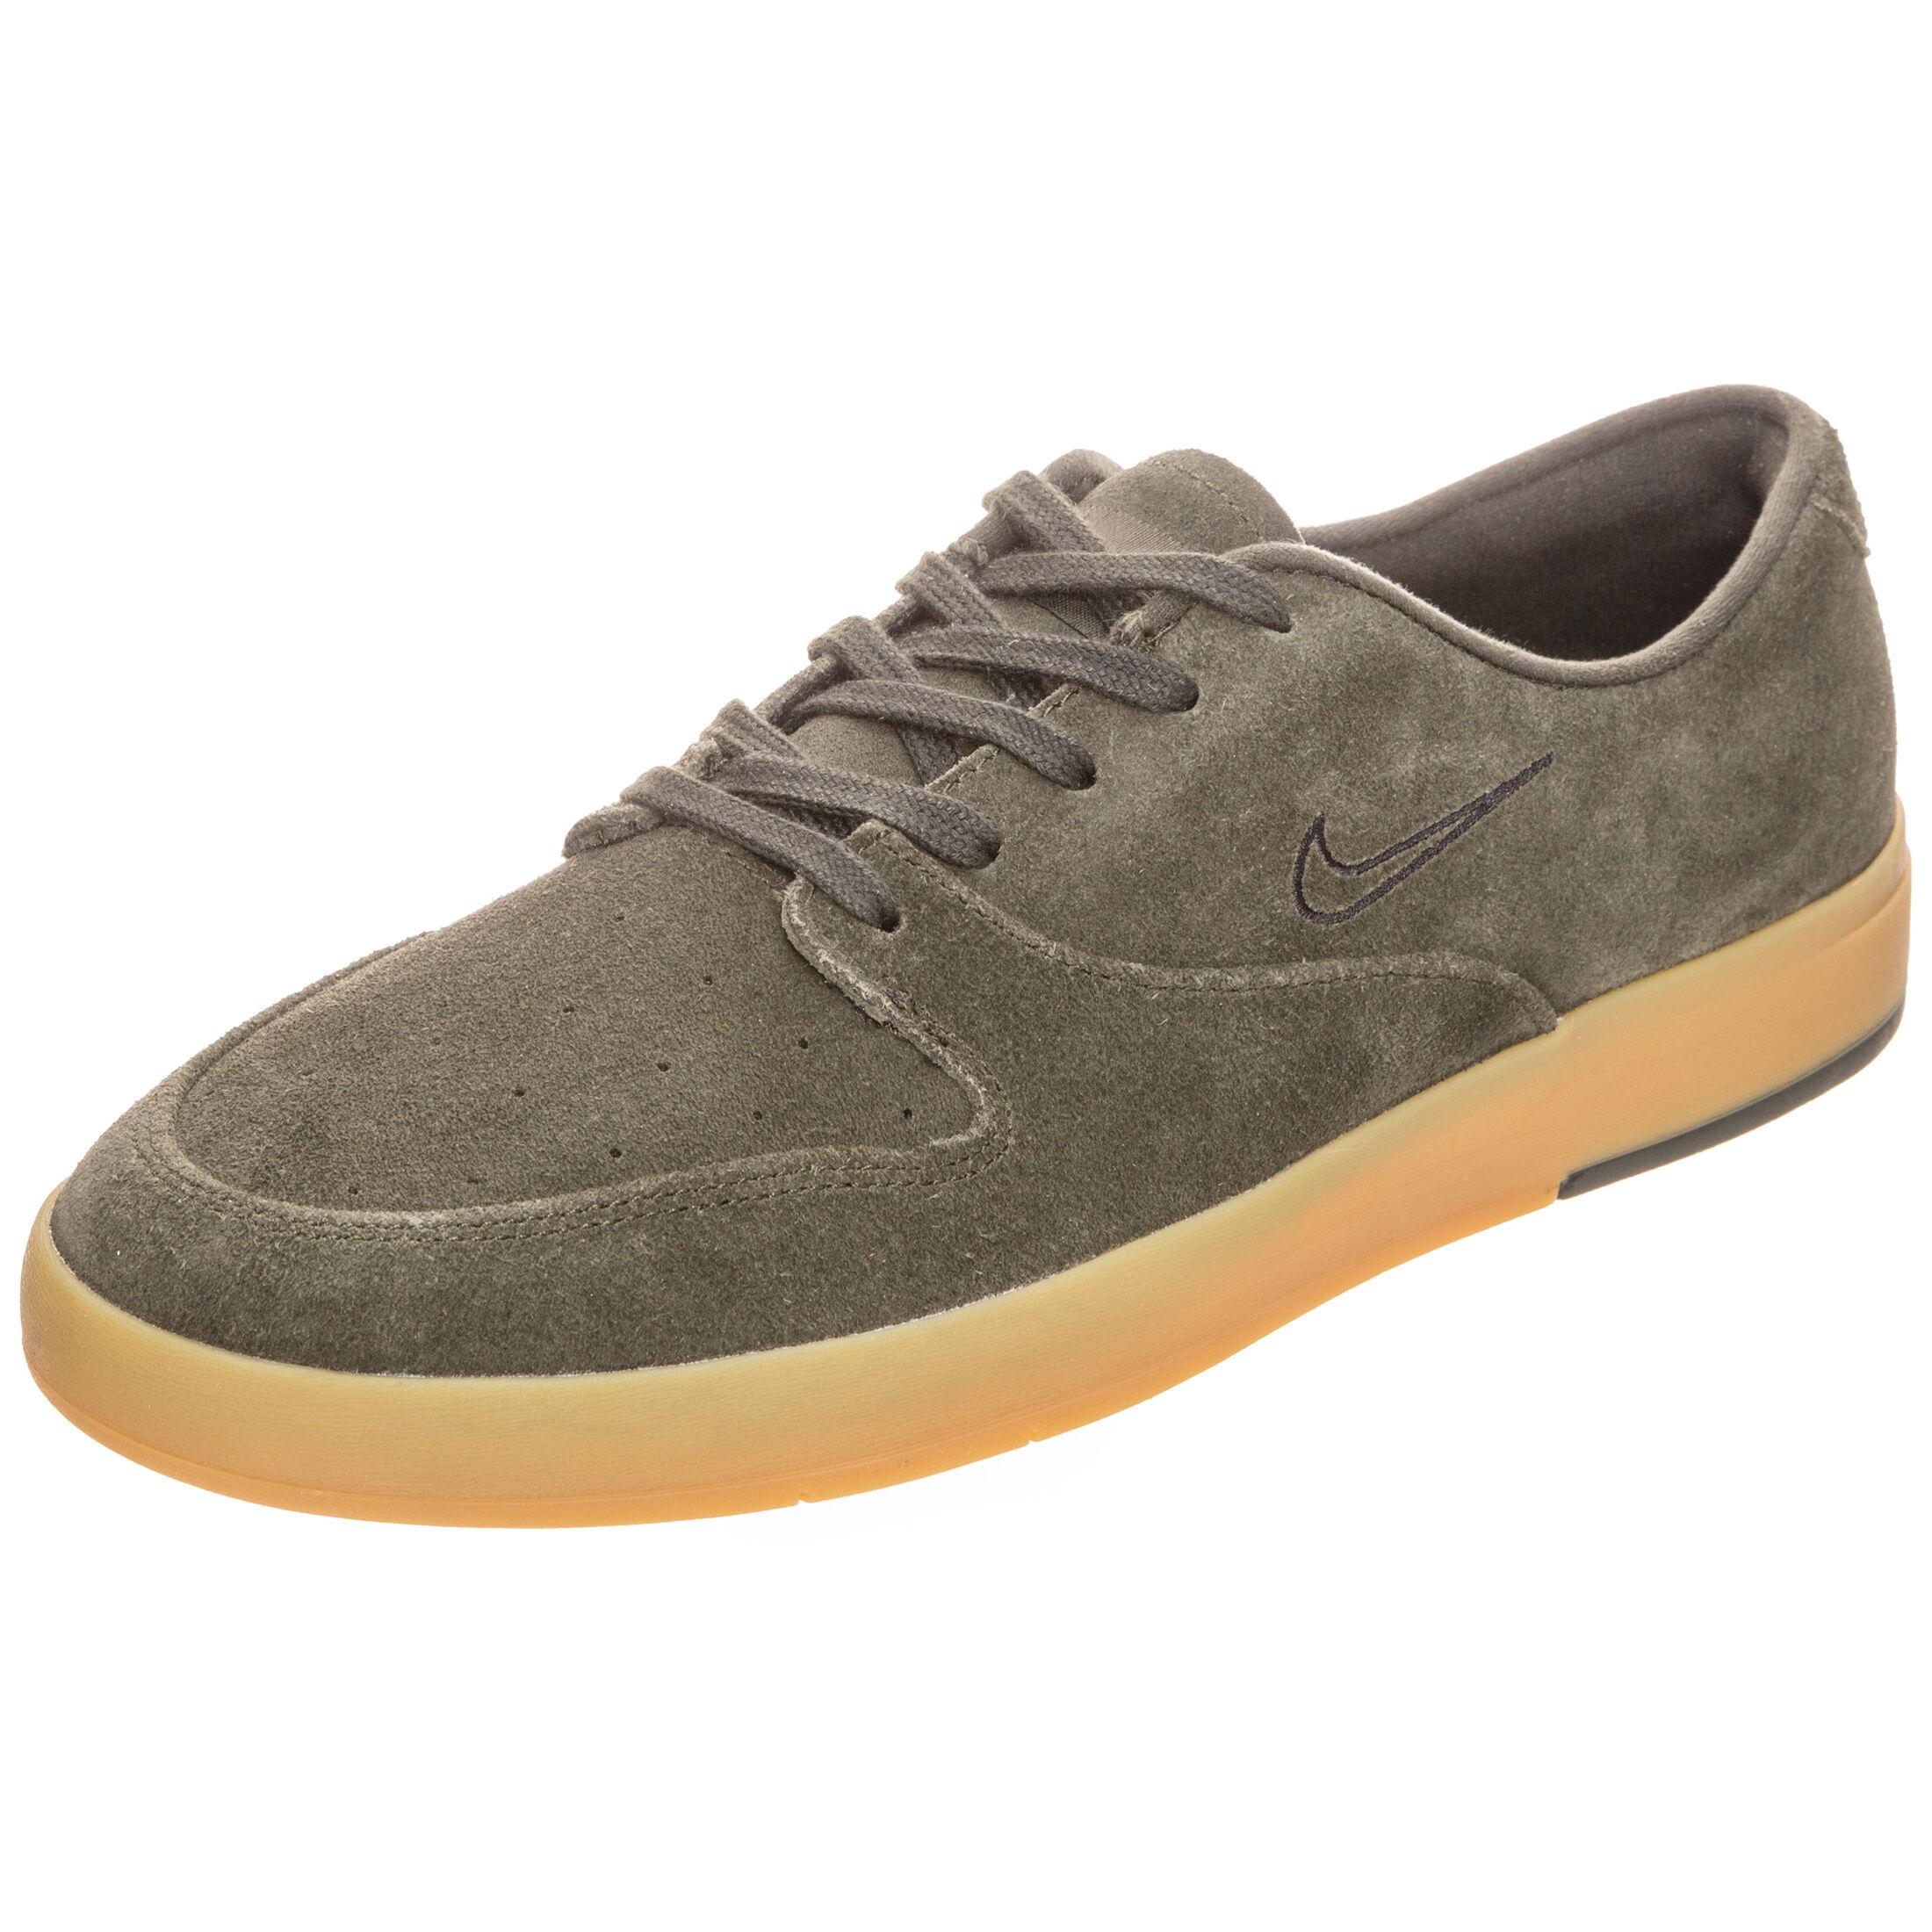 OUTFITTER SBMänner bei Lifestyle Schuhe Nike WEYe2I9DH